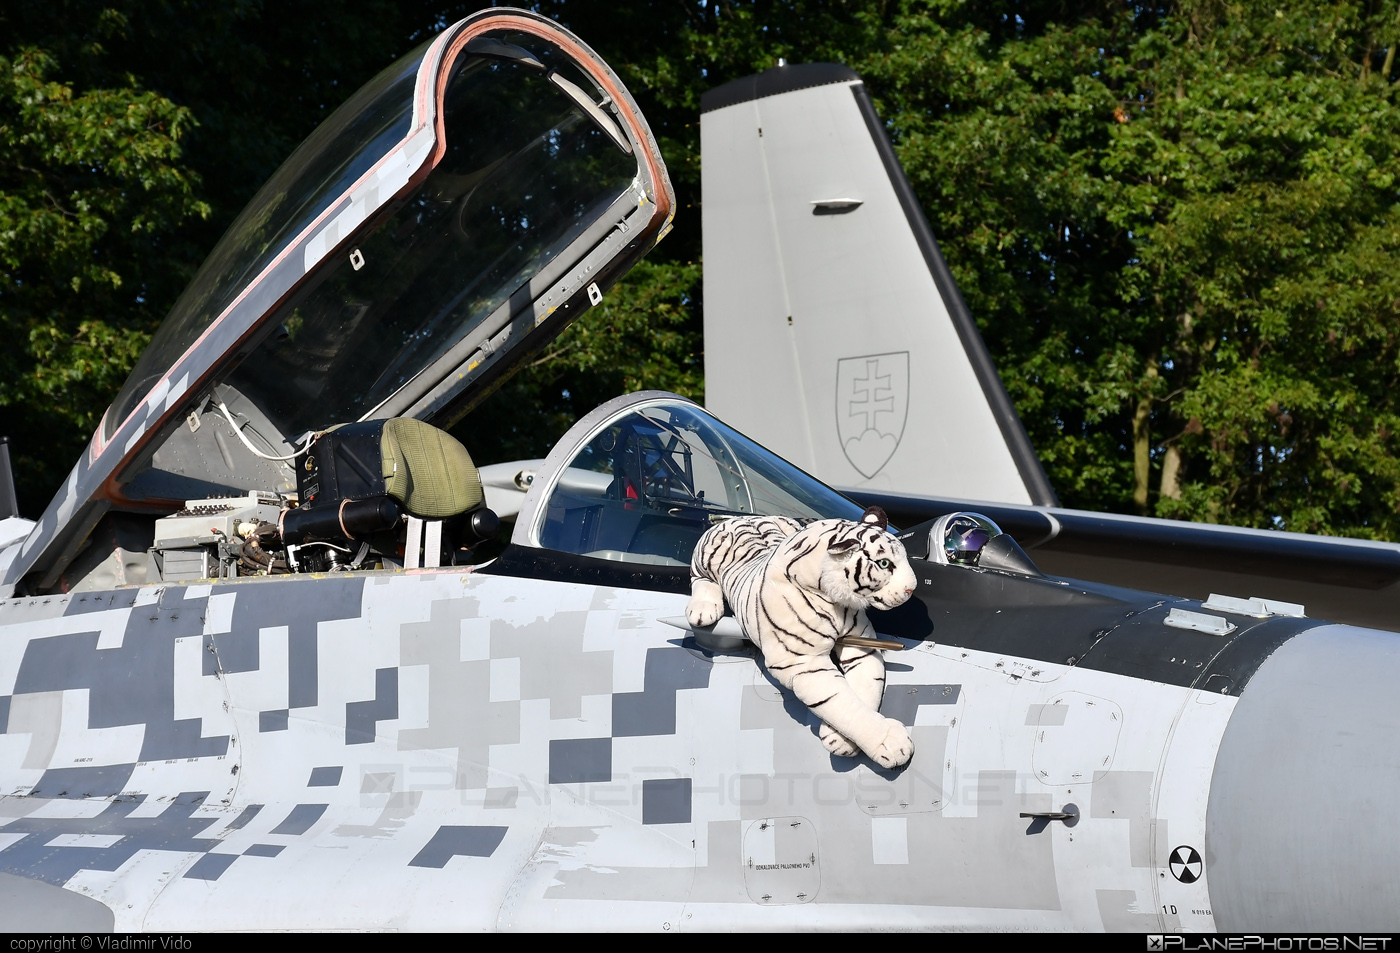 Mikoyan-Gurevich MiG-29AS - 0619 operated by Vzdušné sily OS SR (Slovak Air Force) #mig #mig29 #mig29as #mikoyangurevich #slovakairforce #vzdusnesilyossr